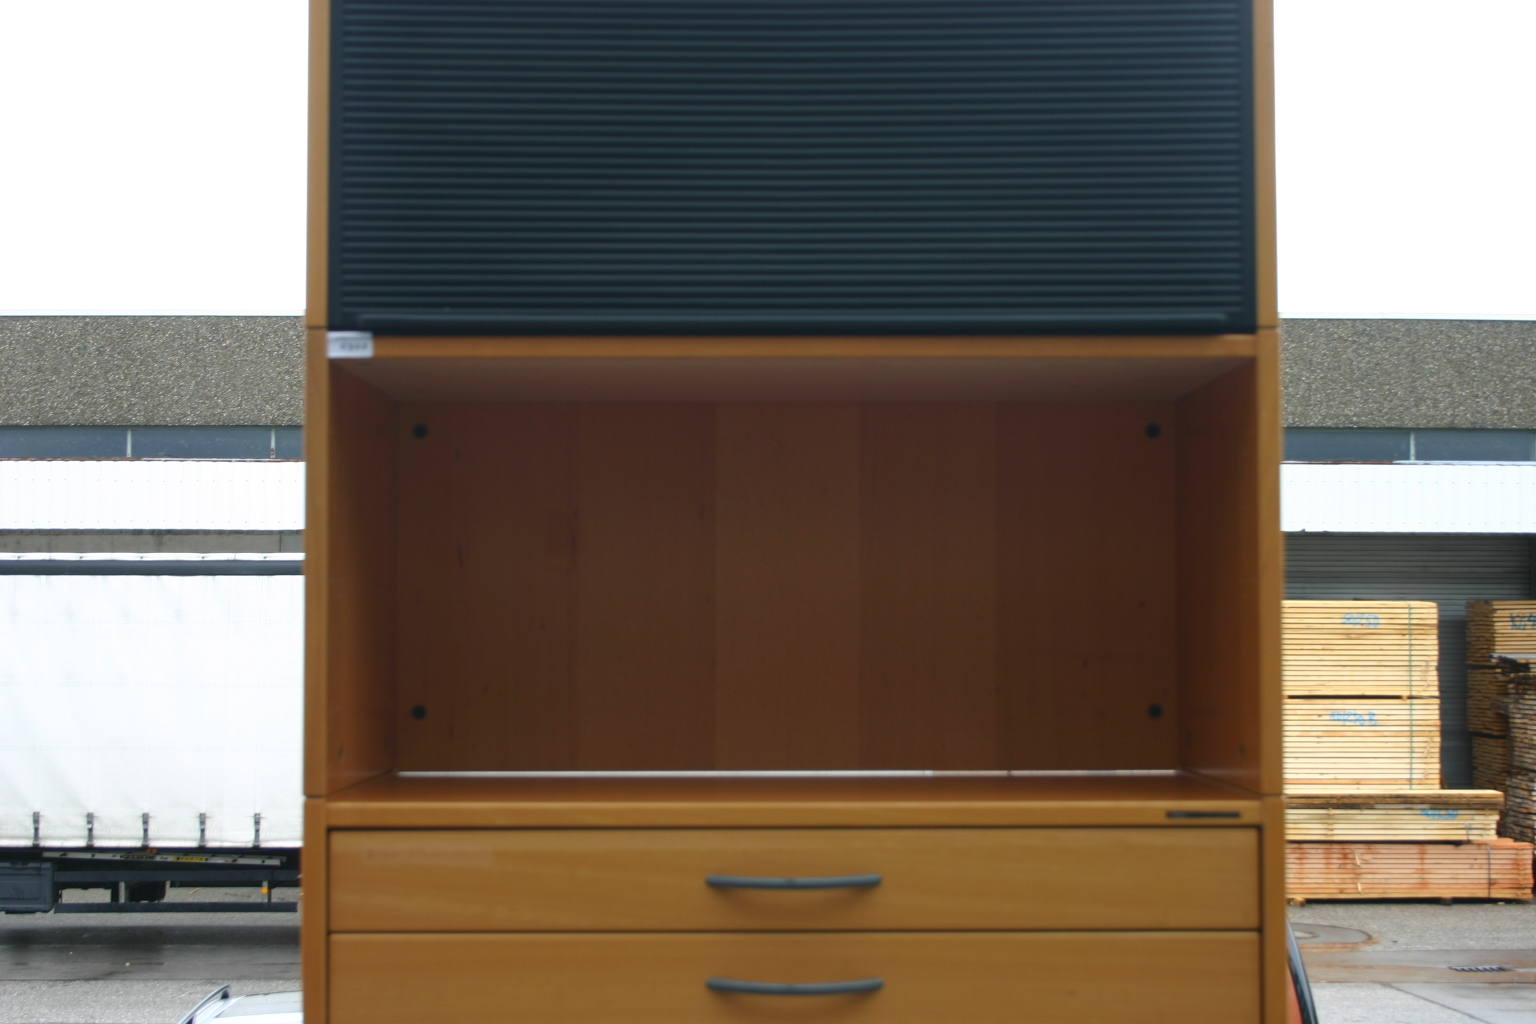 Büromöbel Ikea Effektiv | rheumri.com